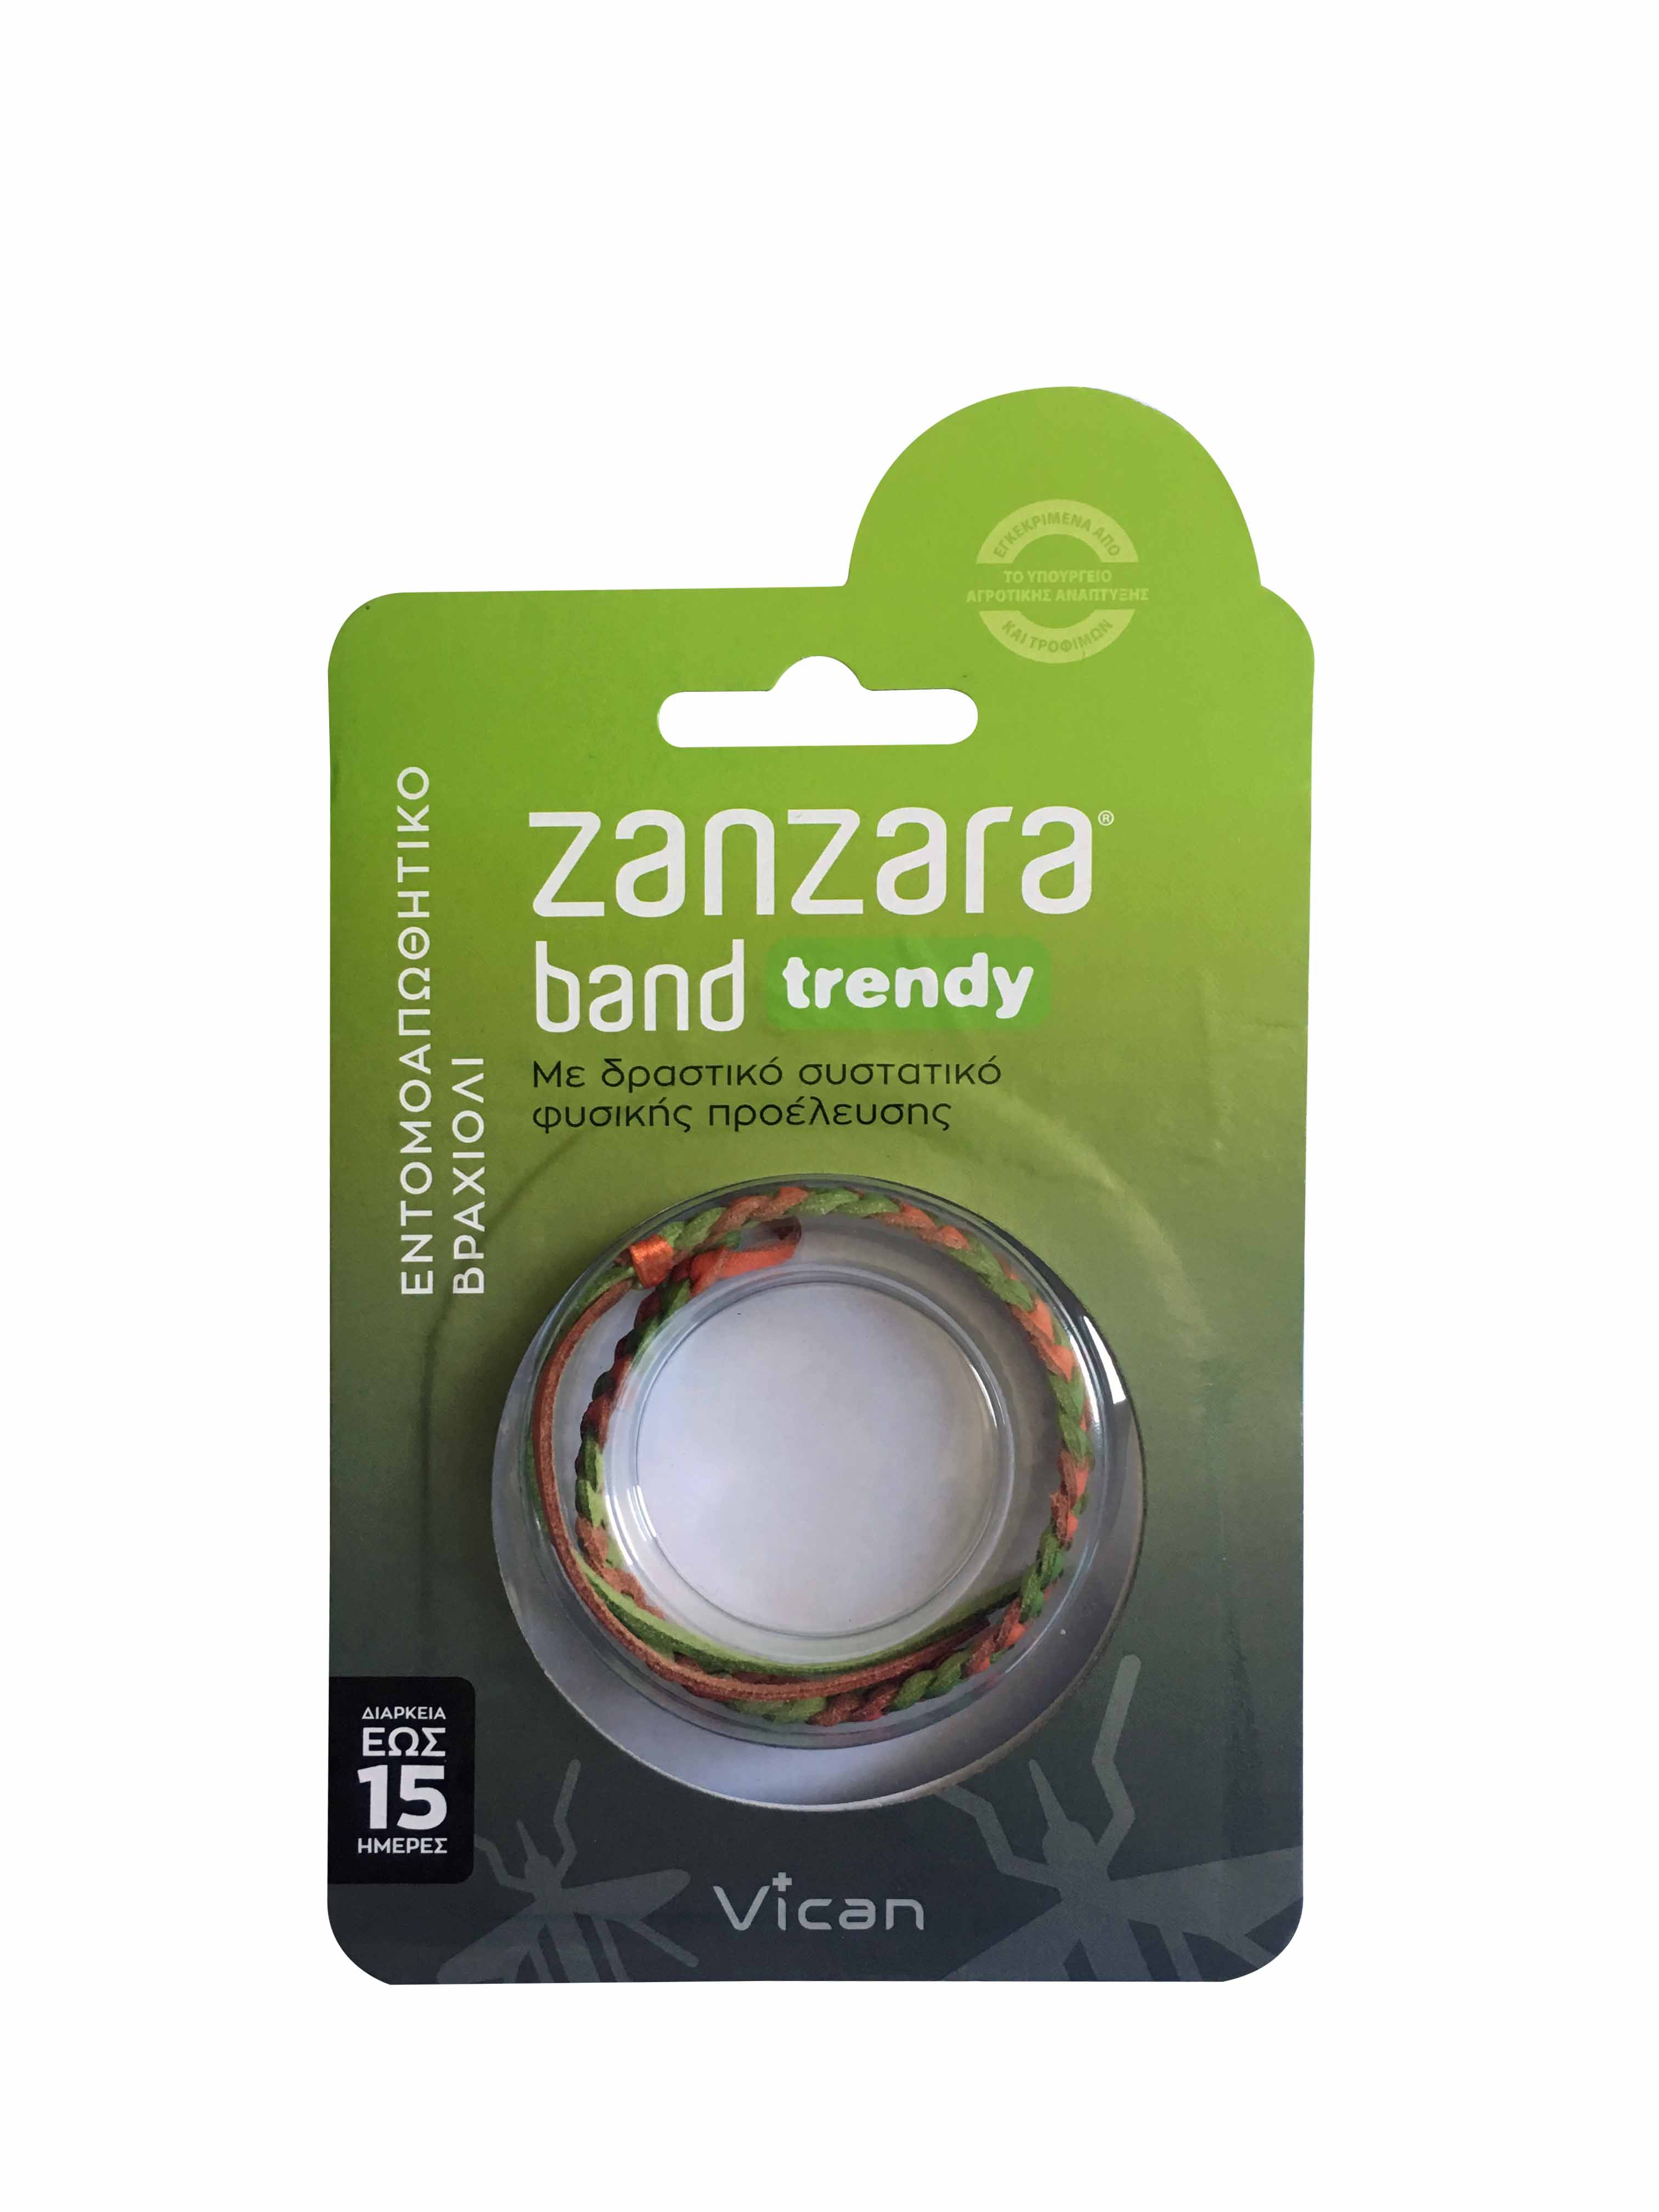 "Zanzara Band ""Trendy"" Εντομοαπωθητικό Βραχιόλι, 1τμχ - Πορτοκαλί"